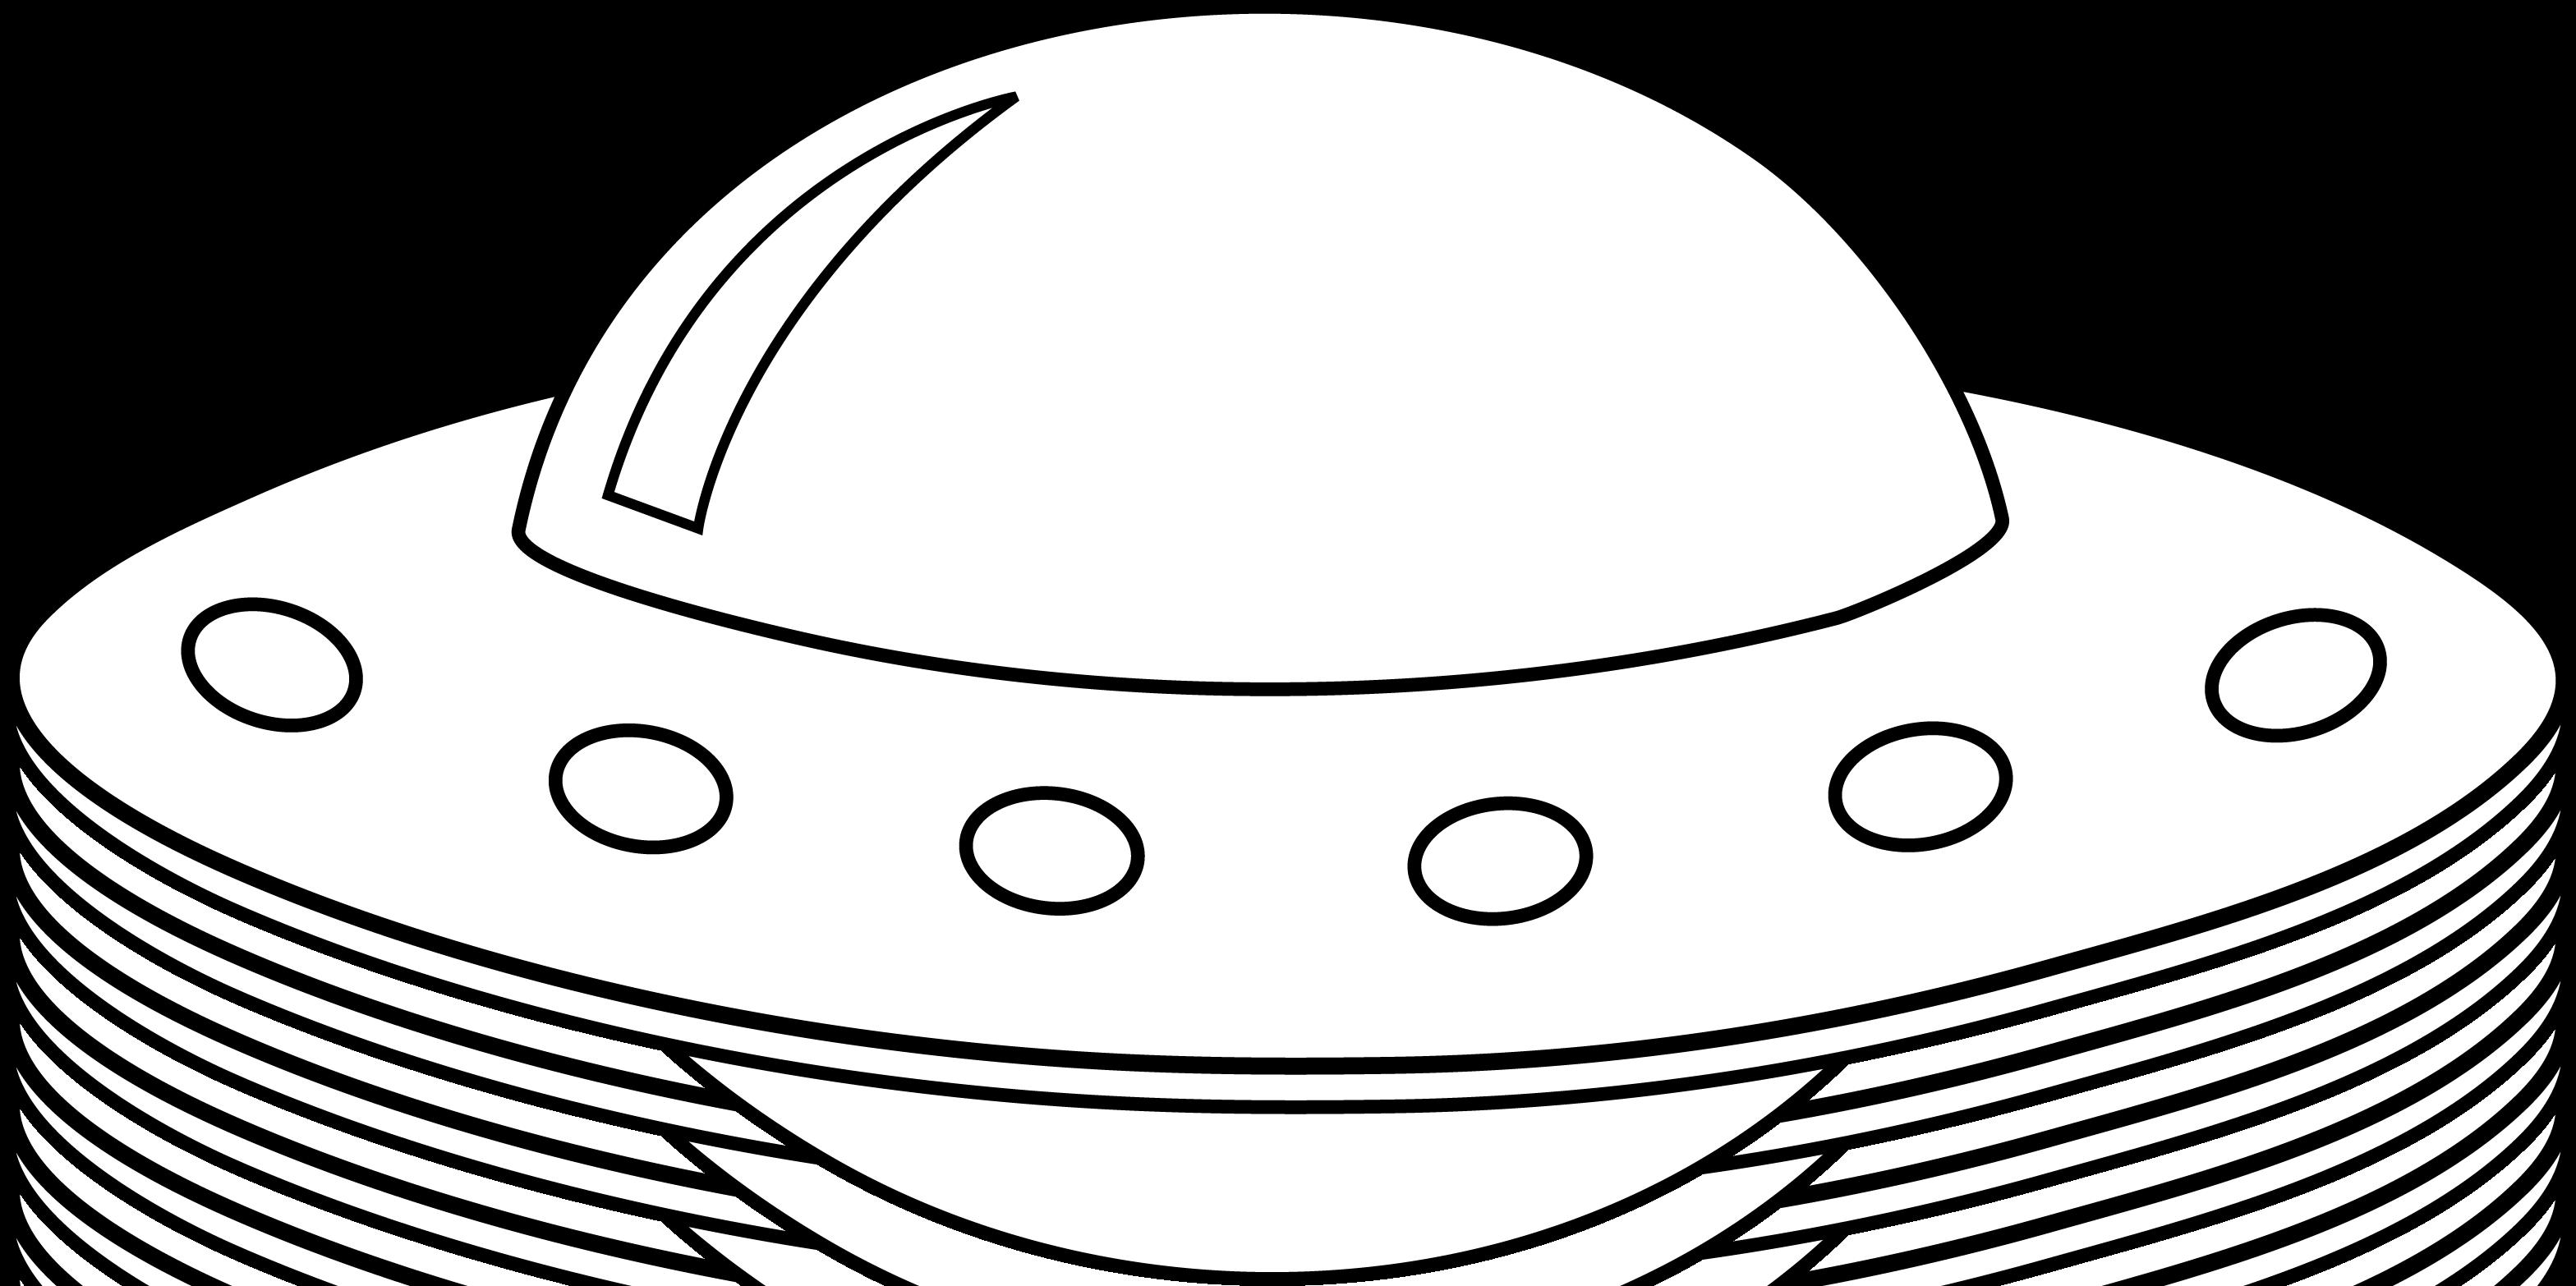 Spaceship clipart easy cartoon.  collection of alien